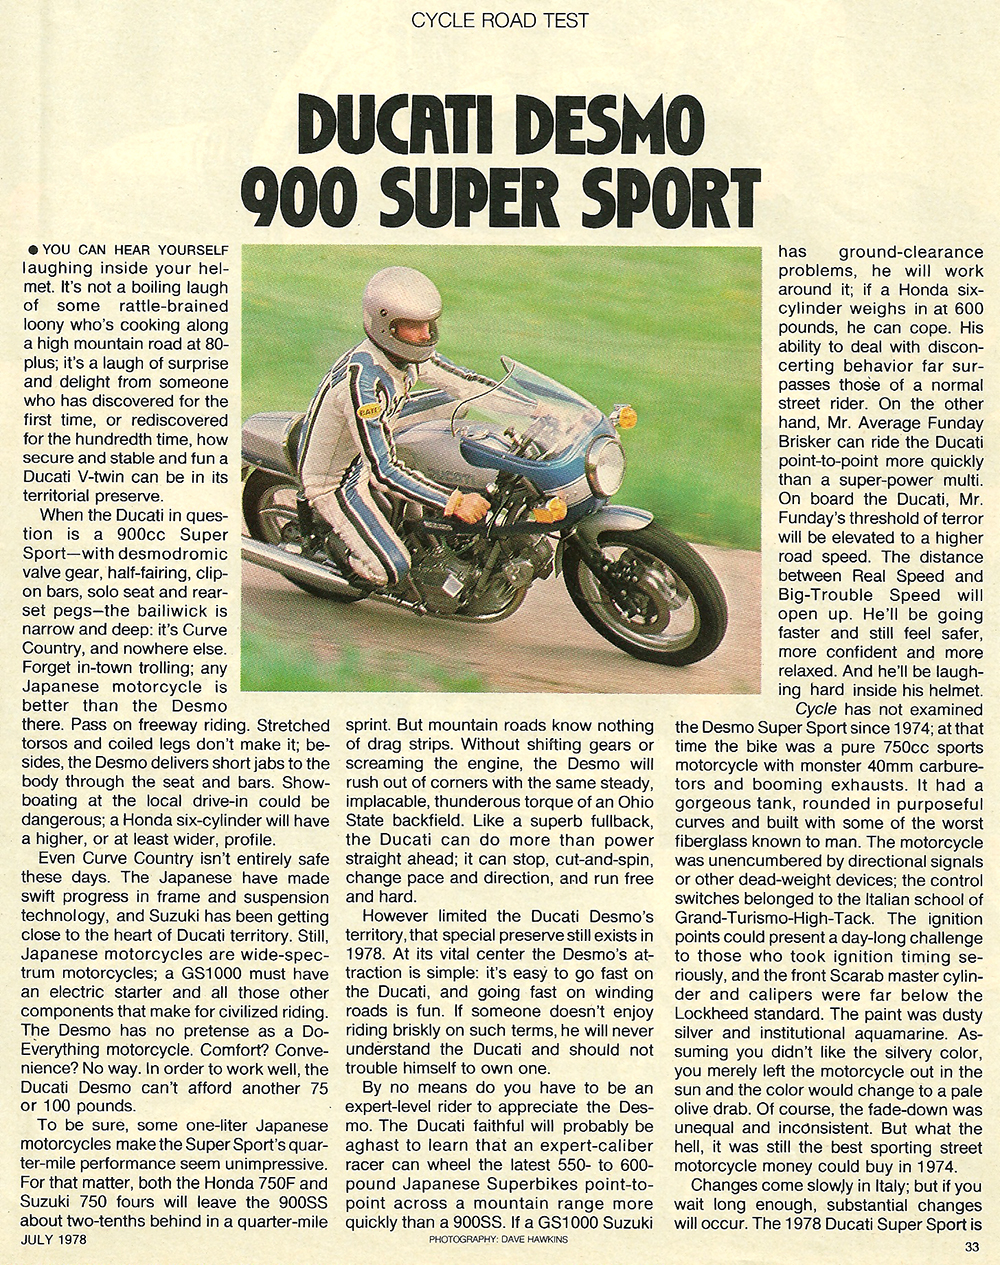 1978 Ducati Desmo 900 Super Sport road test 02.jpg